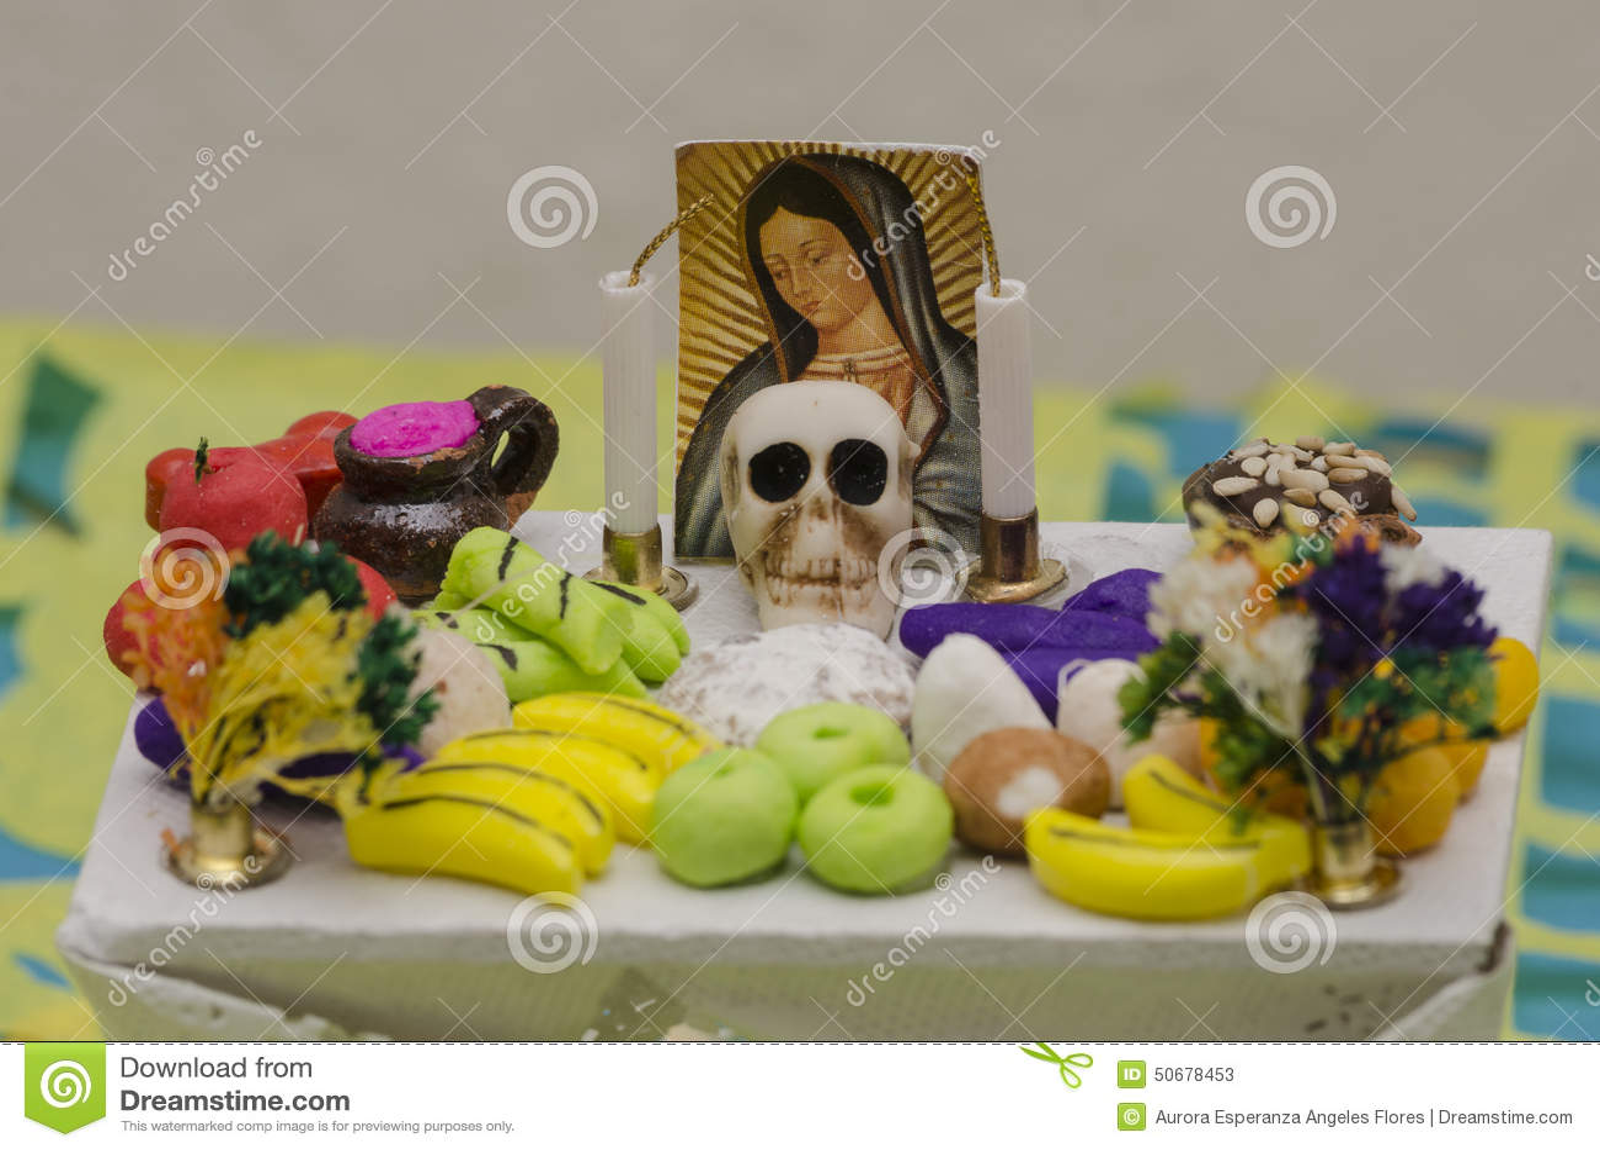 Download 死的提供的法坛的墨西哥天 库存图片. 图片 包括有 食物, 死亡, 水平, 民间传说, 提供, 墨西哥, 蜡烛 - 50678453